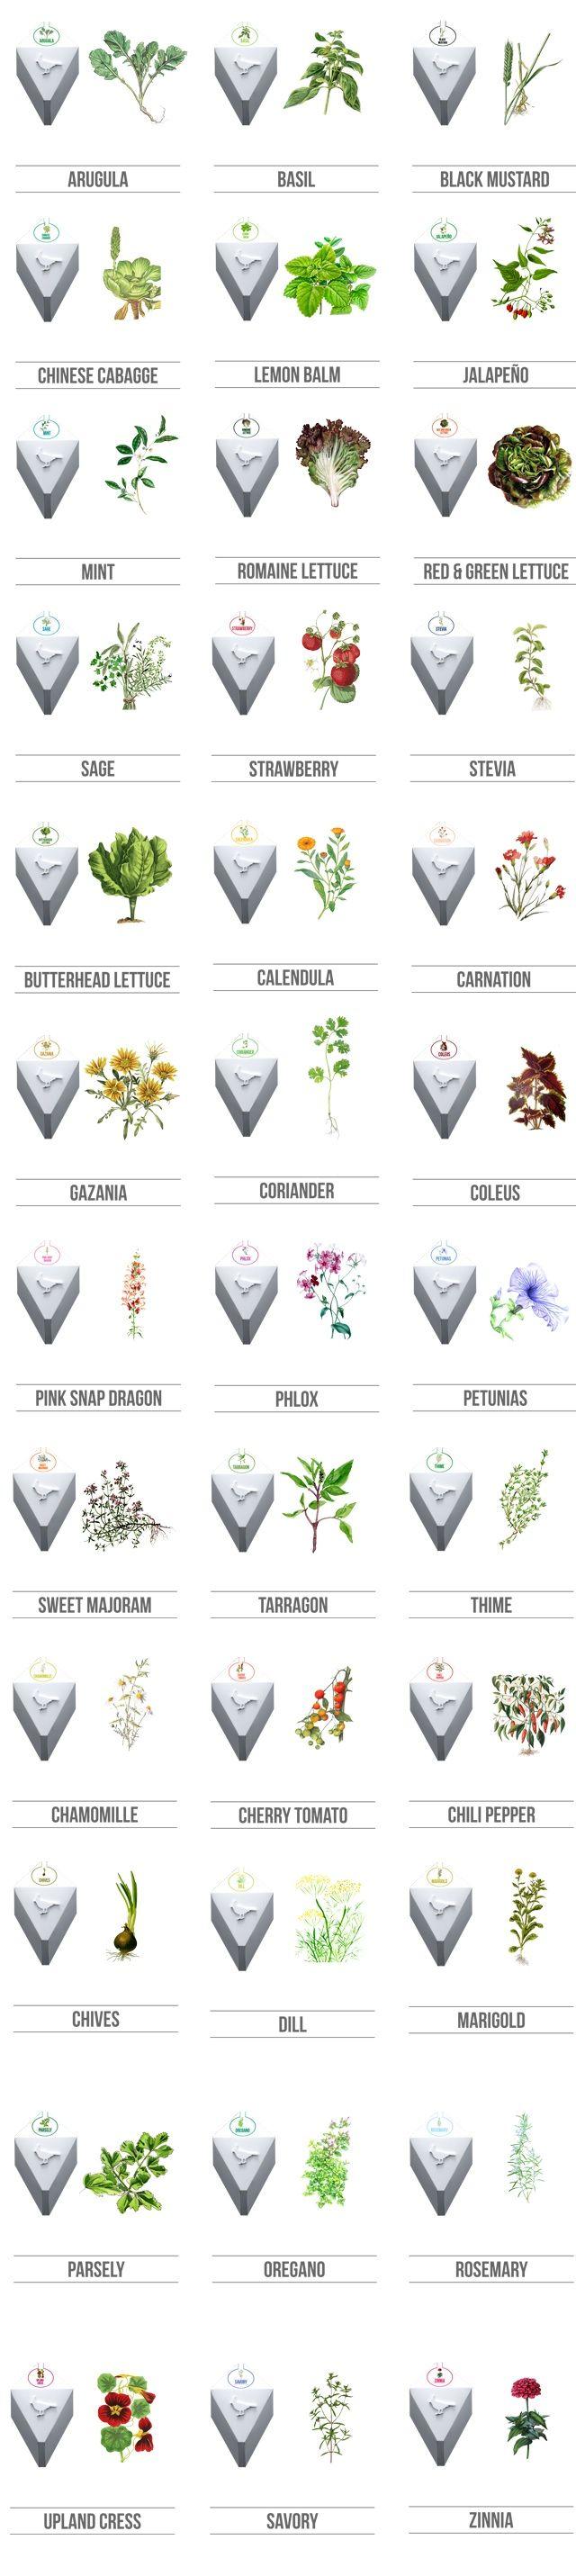 Plug & Plant Smart Vertical Garden by Team Plug & Plant — Kickstarter